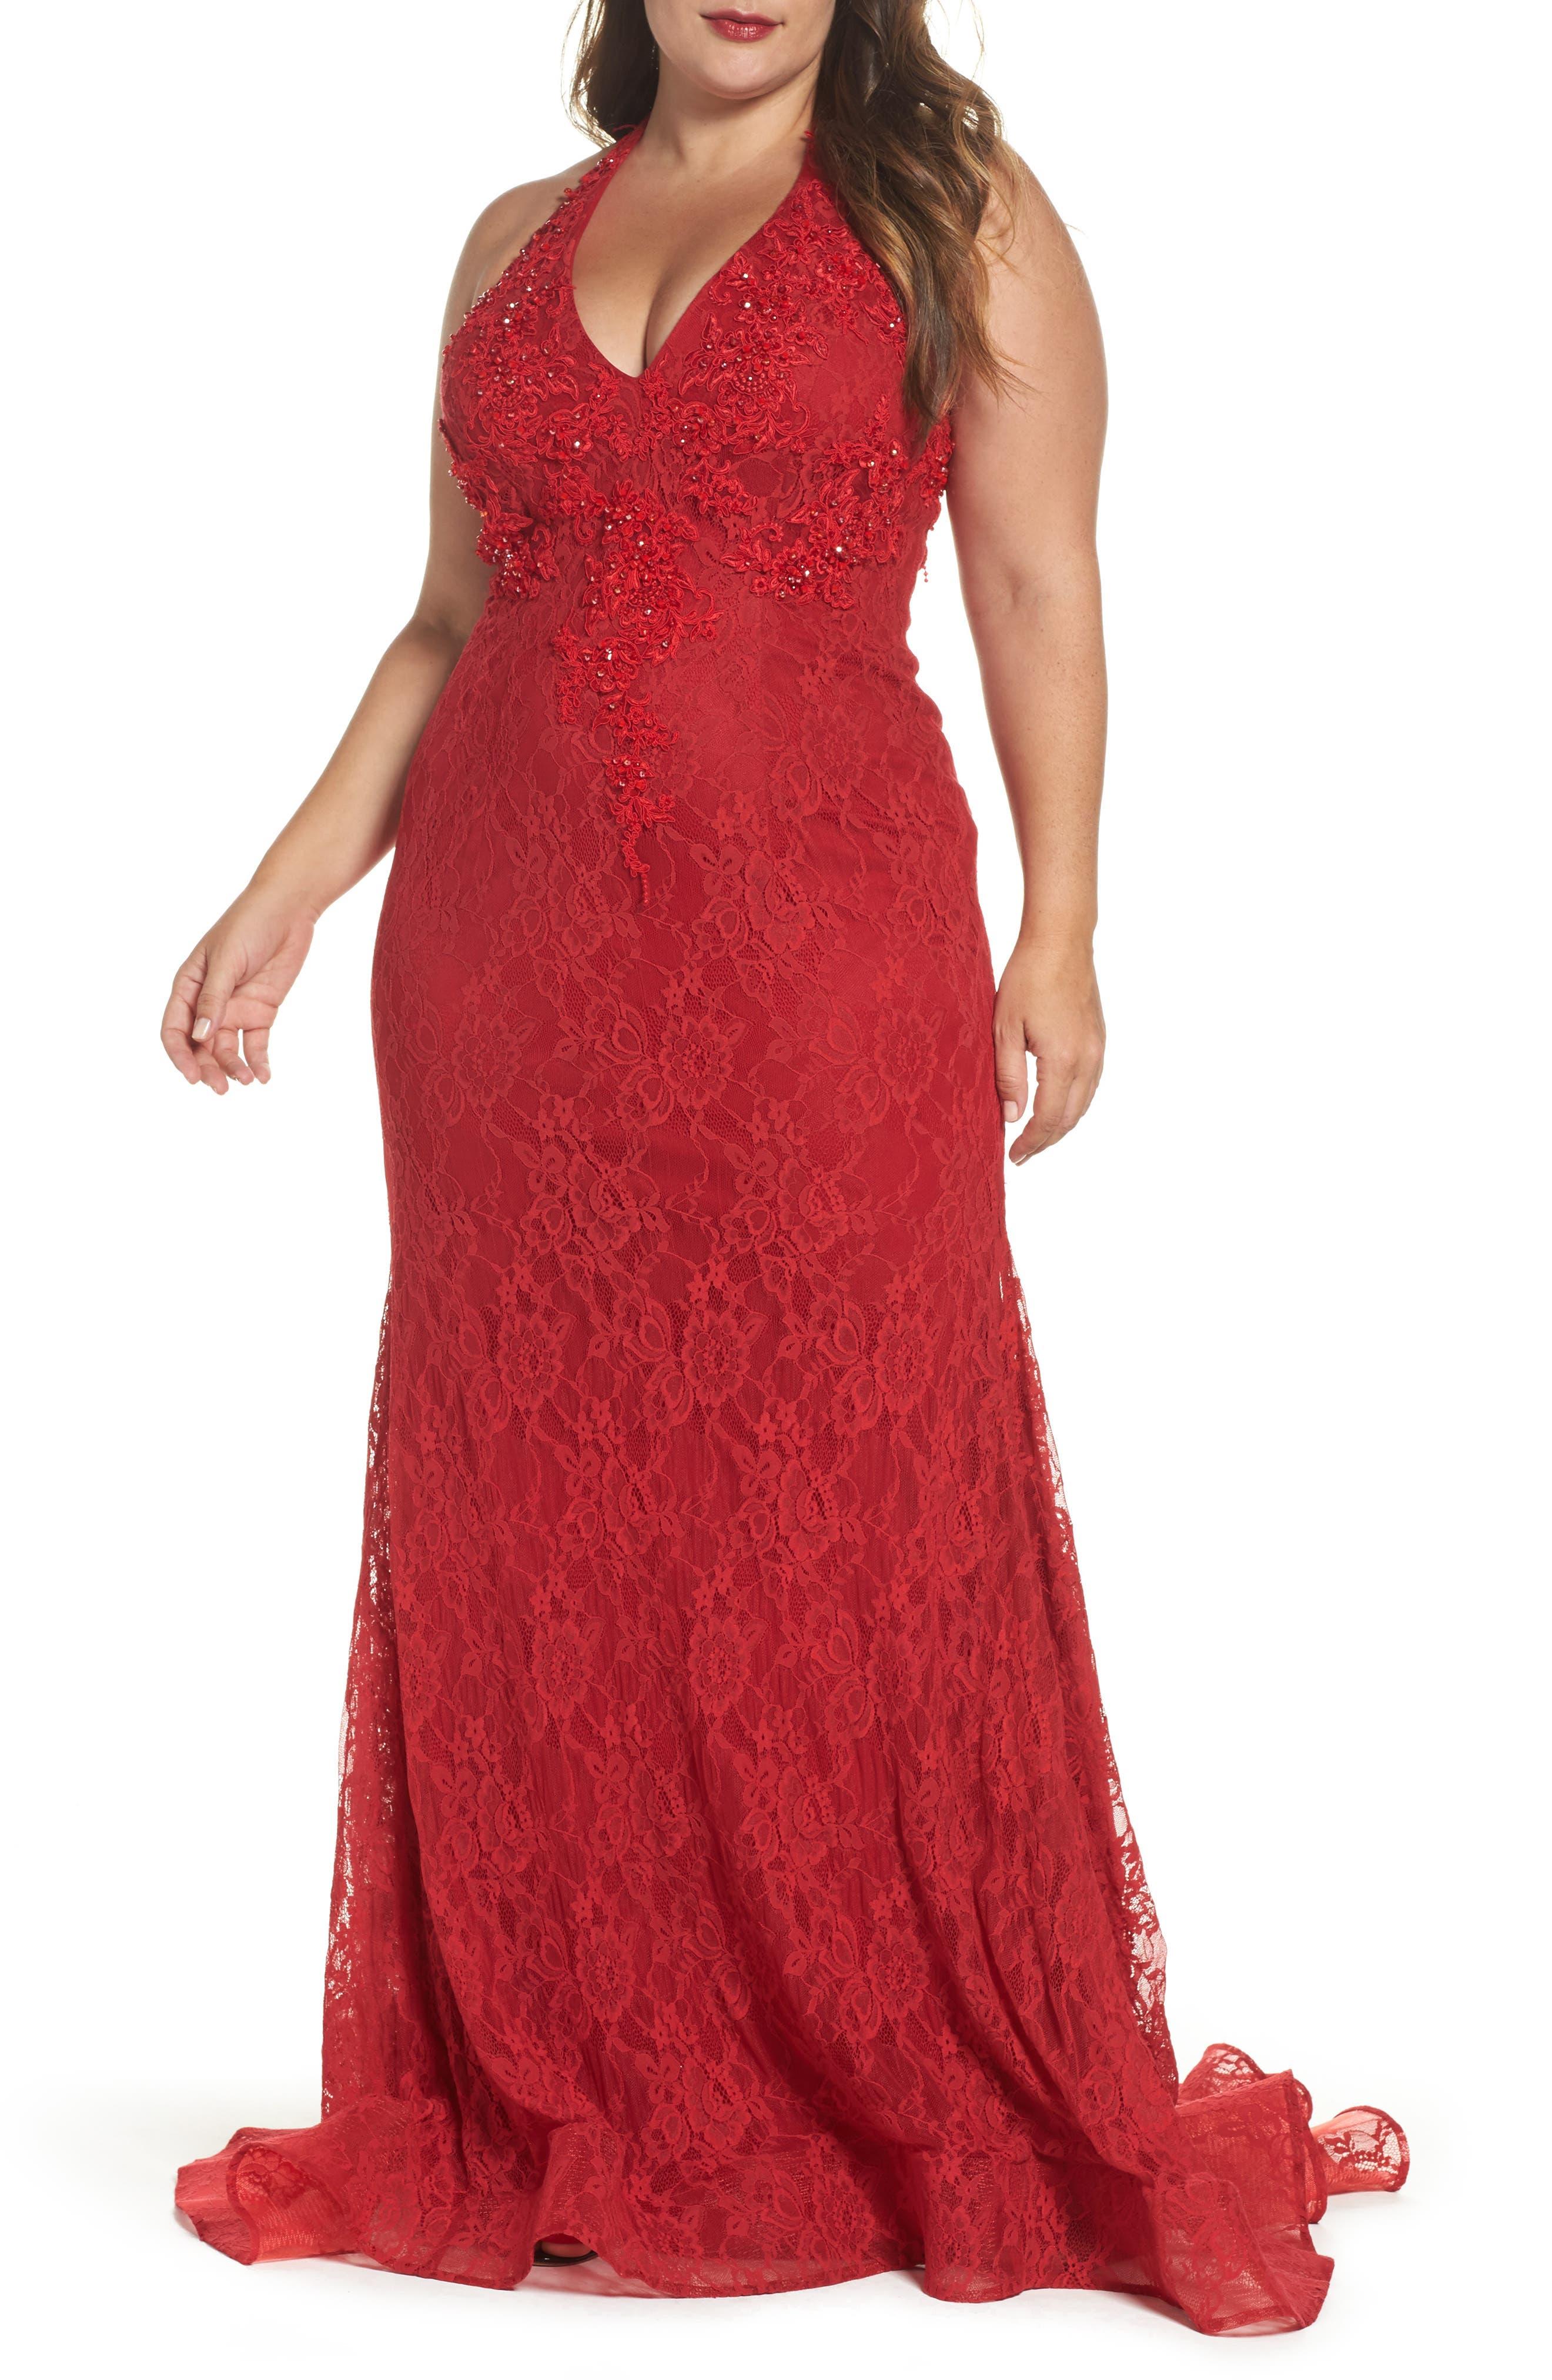 MacDuggal Lace Halter Dress,                             Main thumbnail 1, color,                             Red